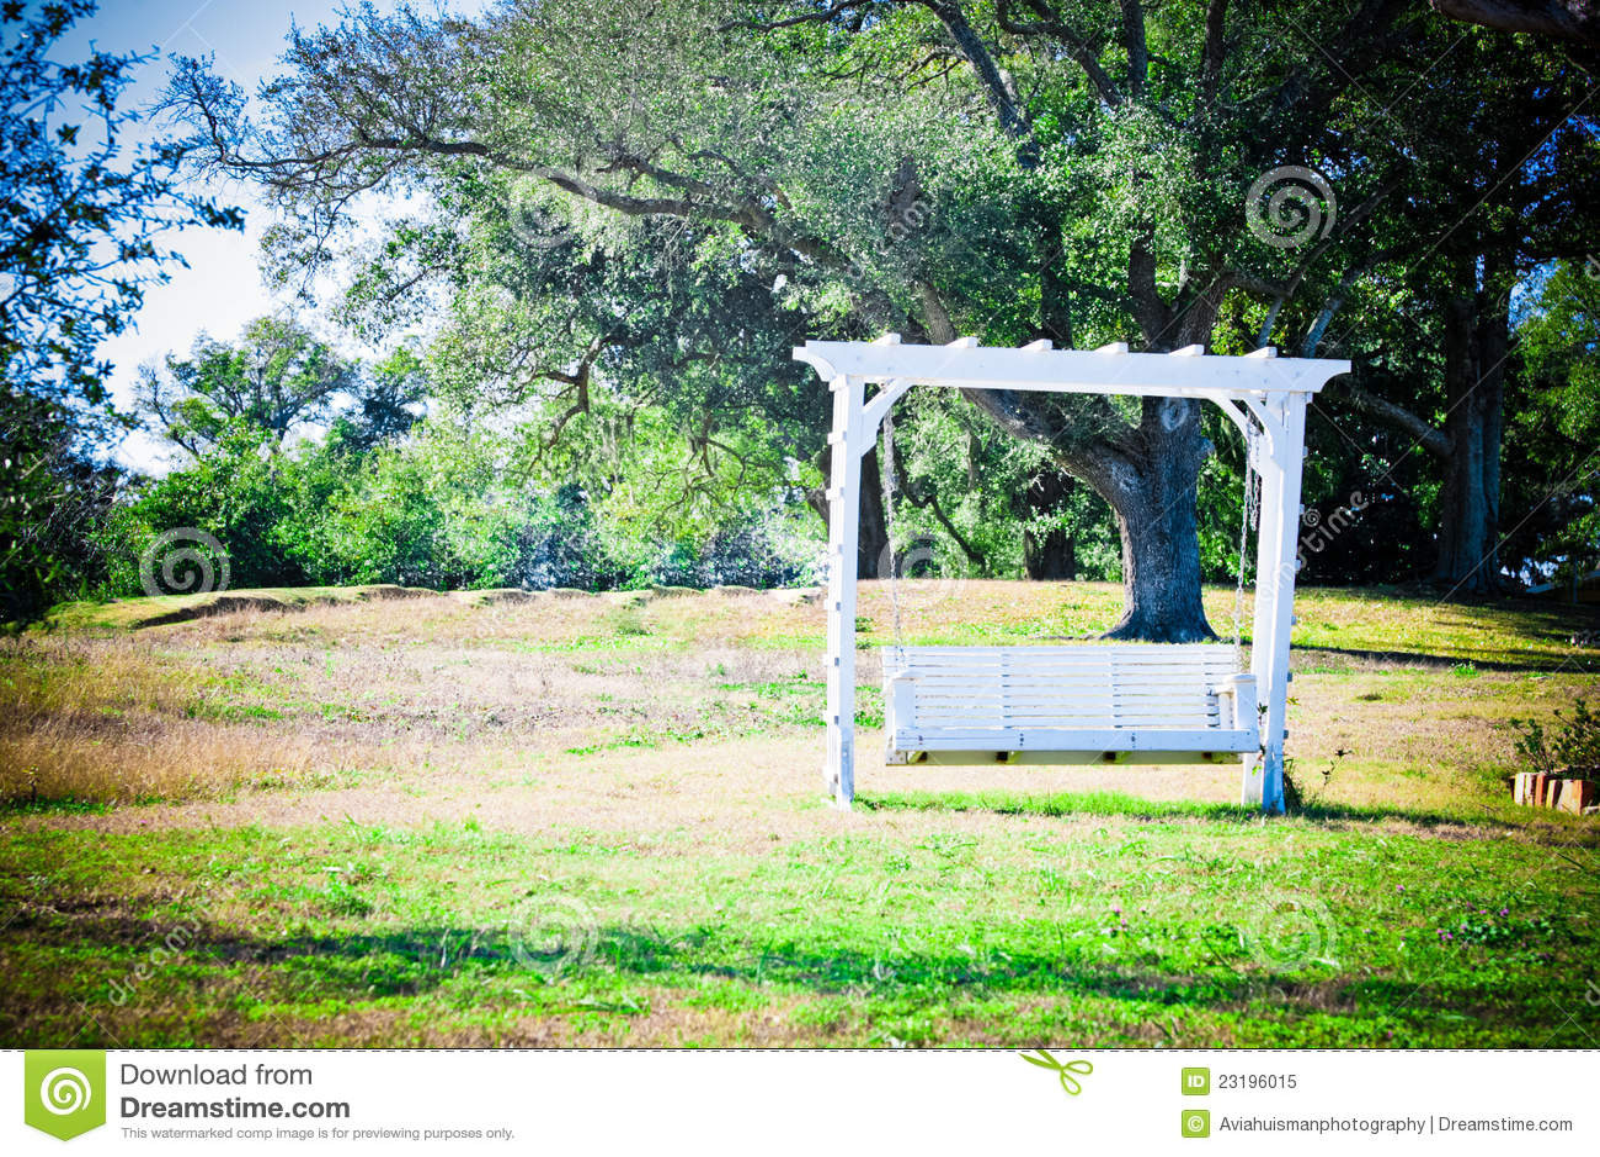 Romantic Garden Bench Swing Stock Image Image Of